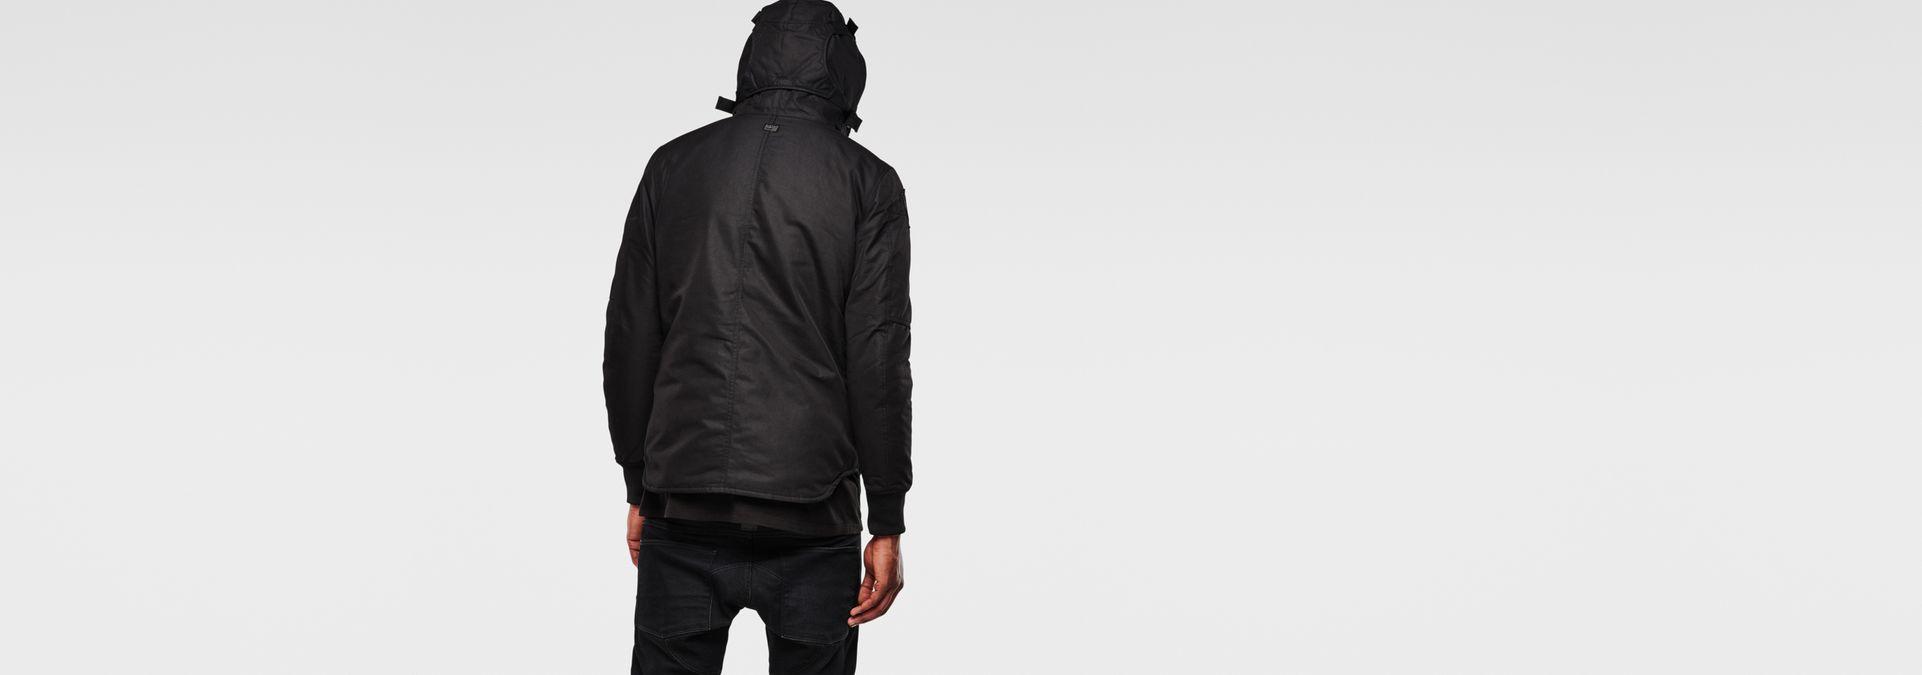 Jacket Hooded Lightweight Black Batt G Raw® Star vERwc 59cd38730aed